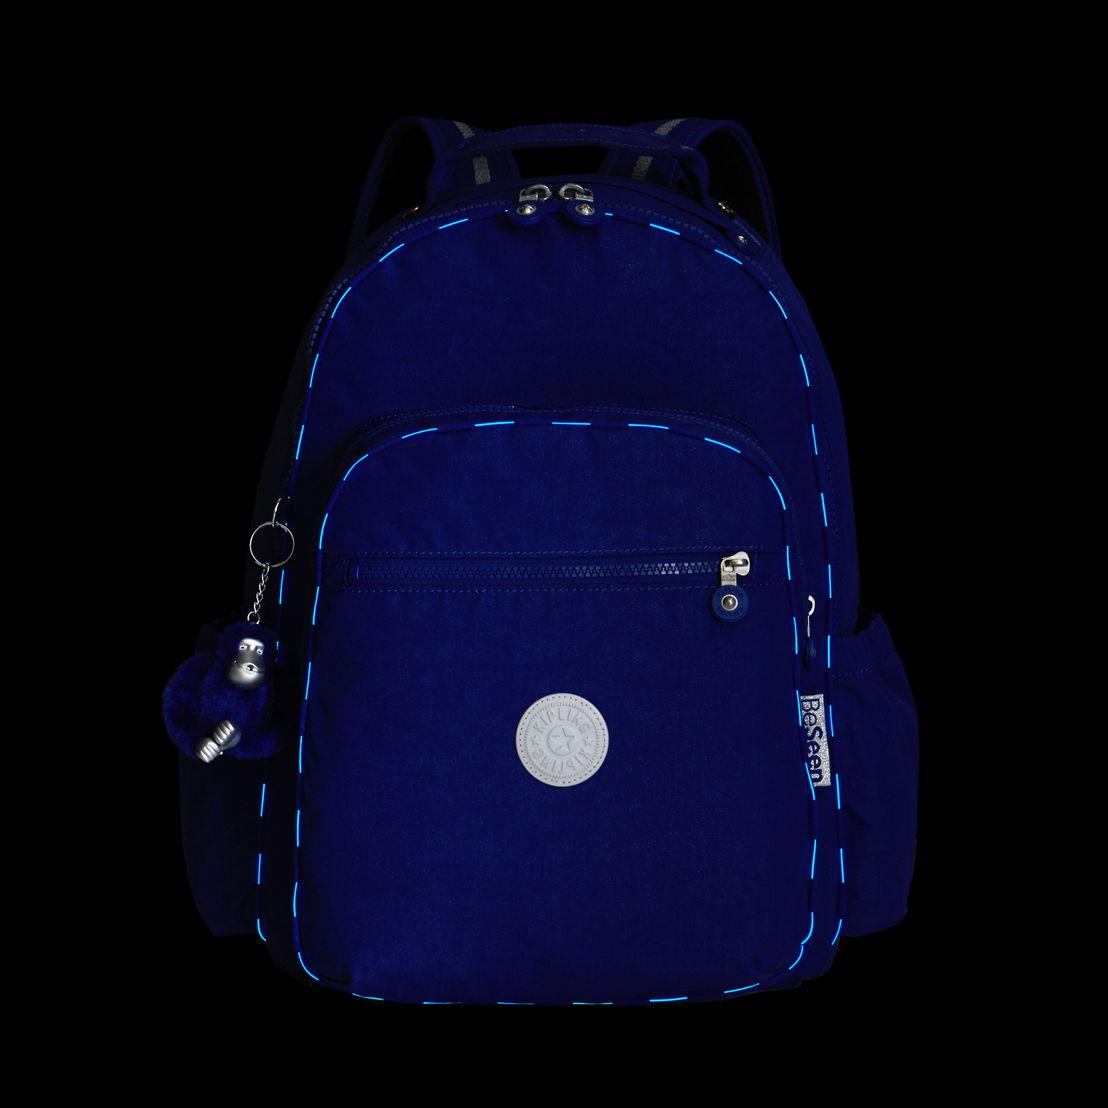 SEOUL GO Cobalt F Light - £124